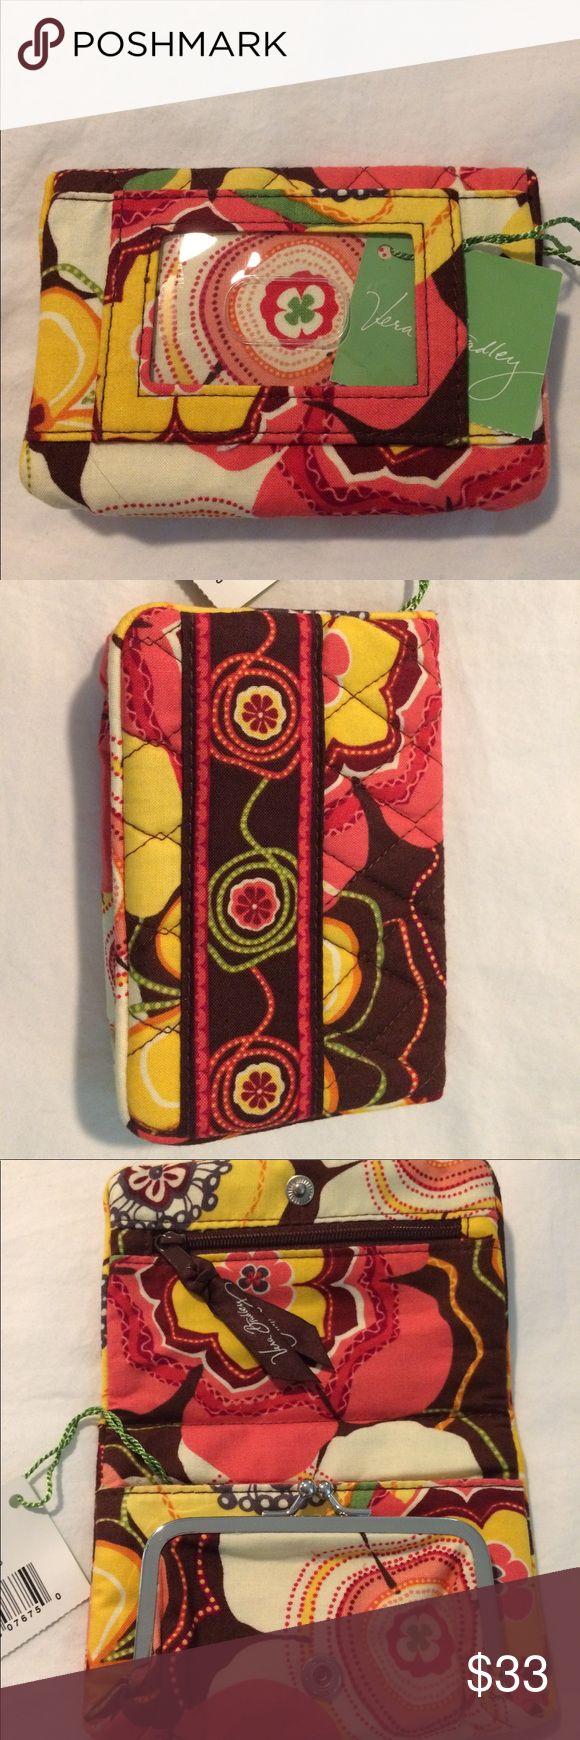 "Vera Bradley wallet ""One for the Money"" Buttercup NWT Vera Bradley wallet ""One for the Money"" in Buttercup pattern. Vera Bradley Bags Wallets"